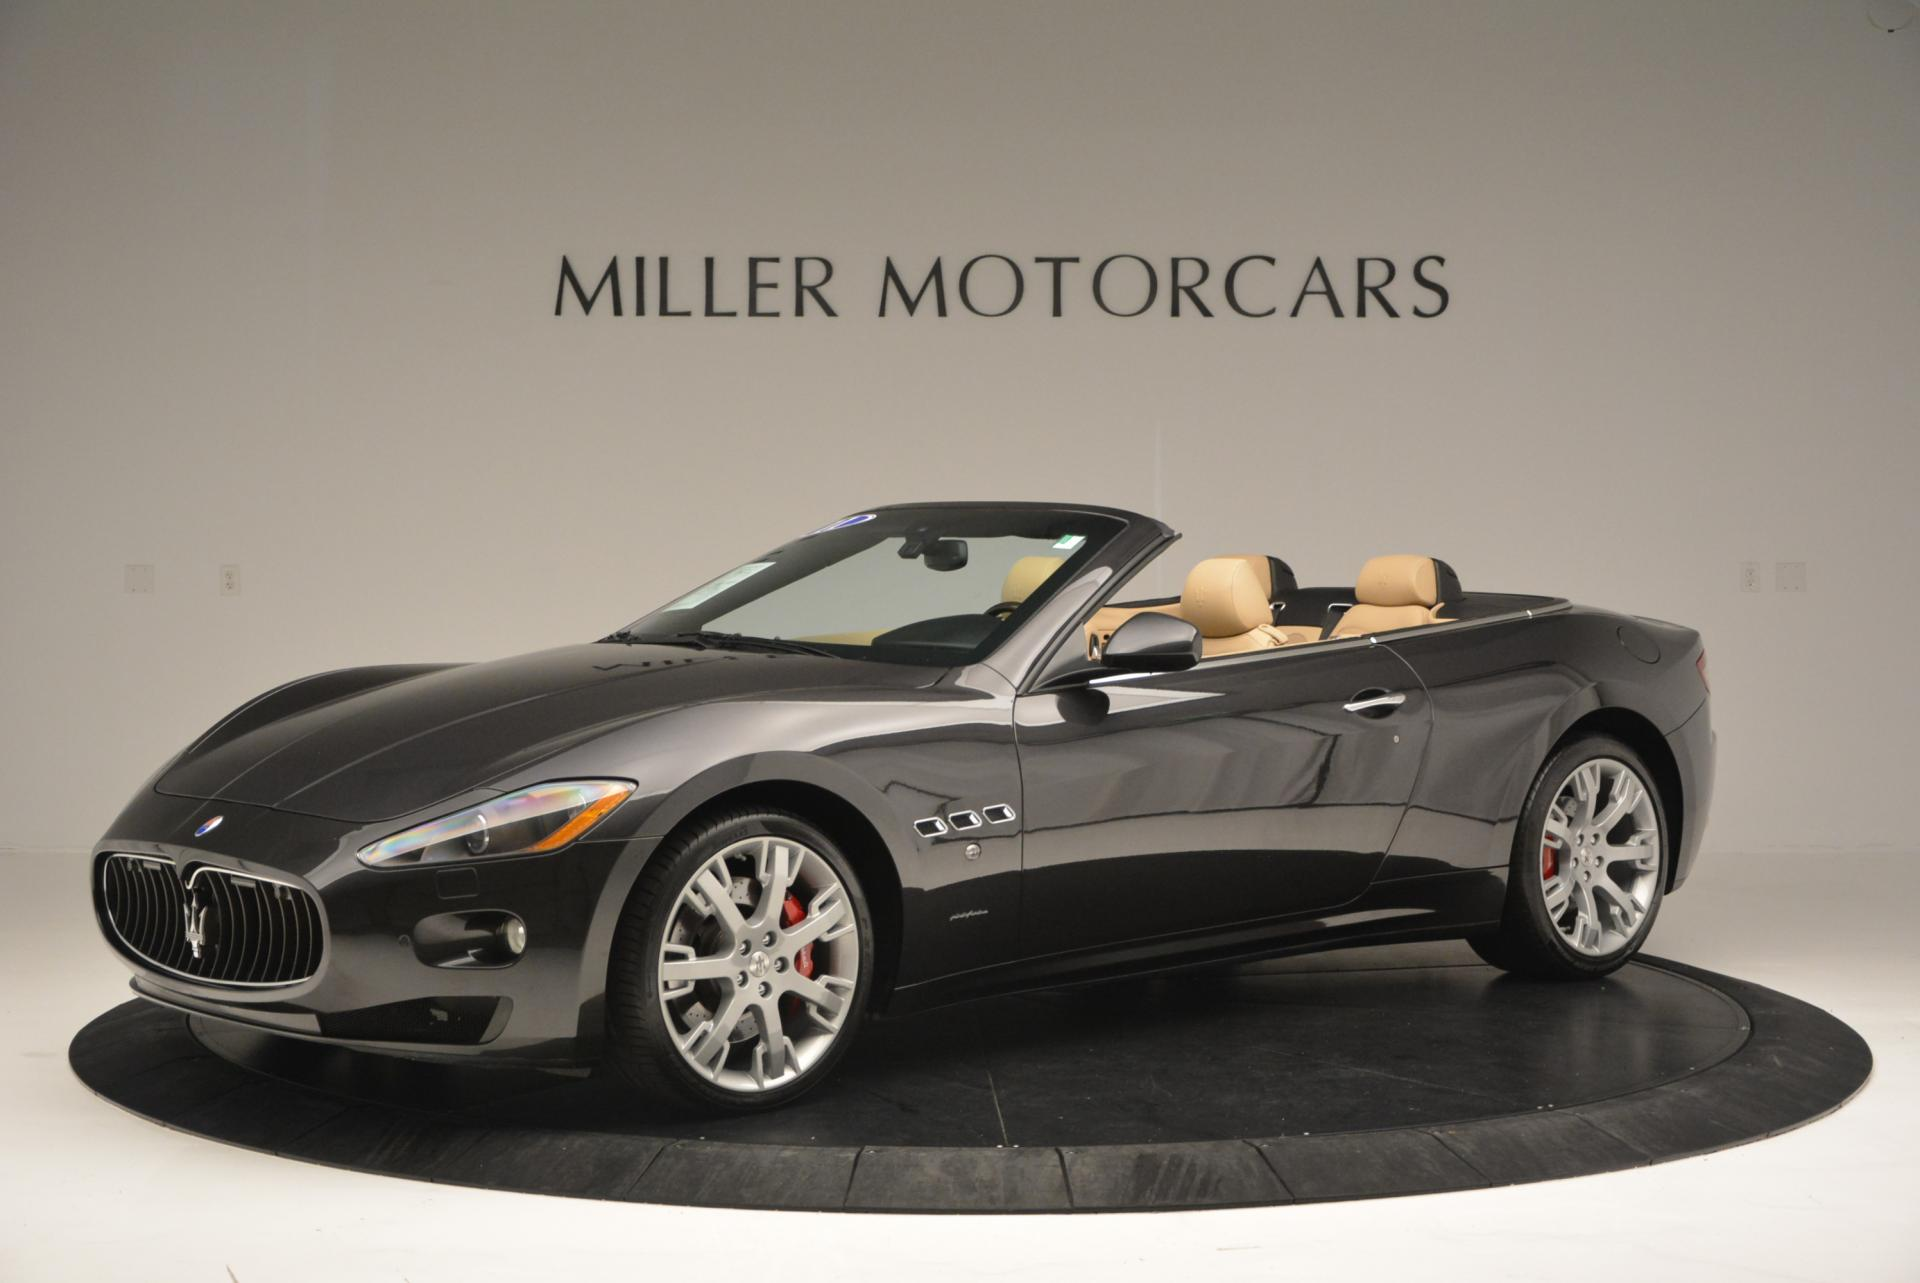 Used 2011 Maserati GranTurismo Base For Sale In Westport, CT 158_p2